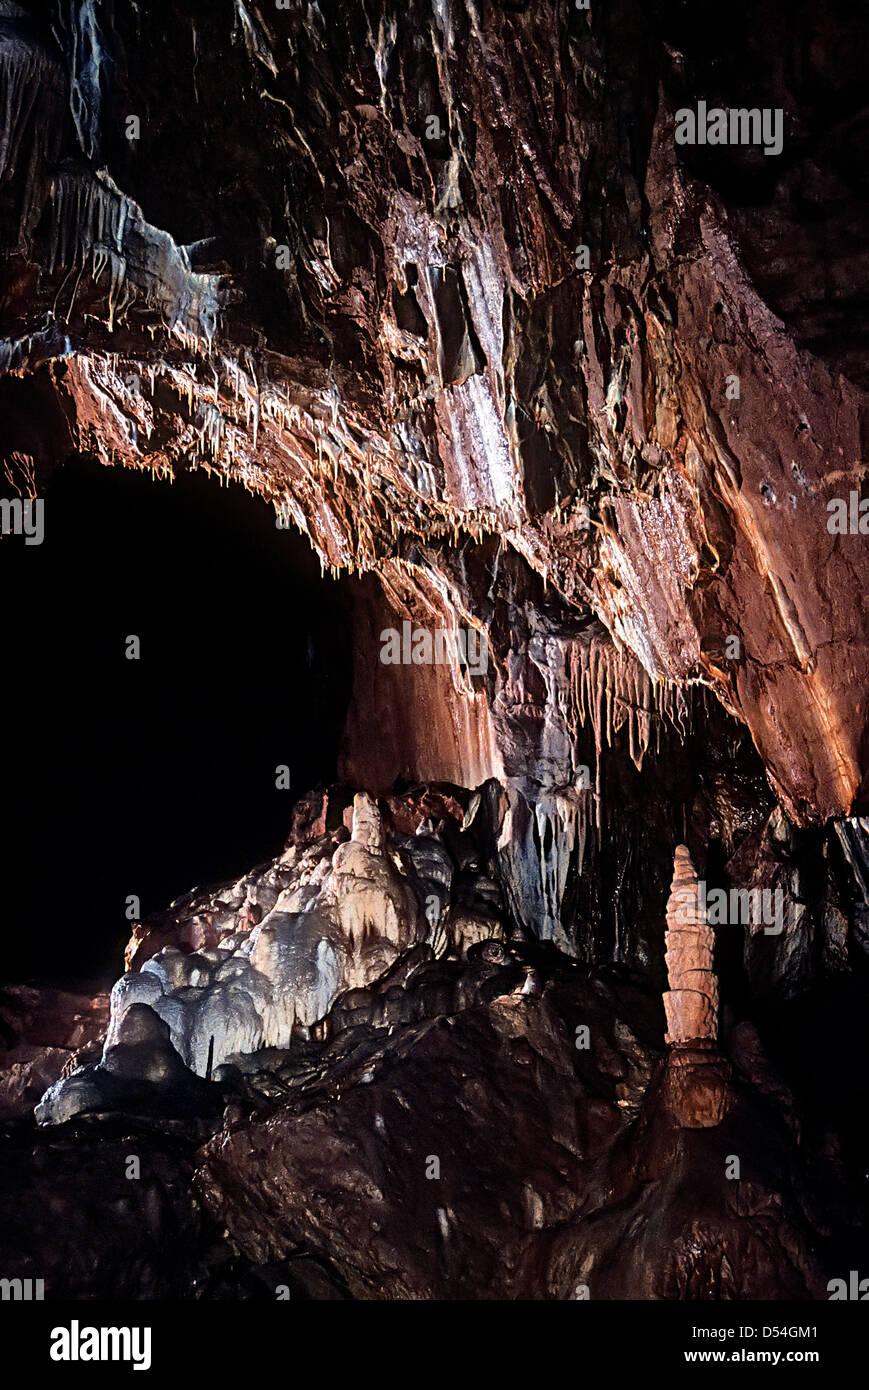 Jeskyne Balcarka, Moravian karst, Czech Republic - Stock Image